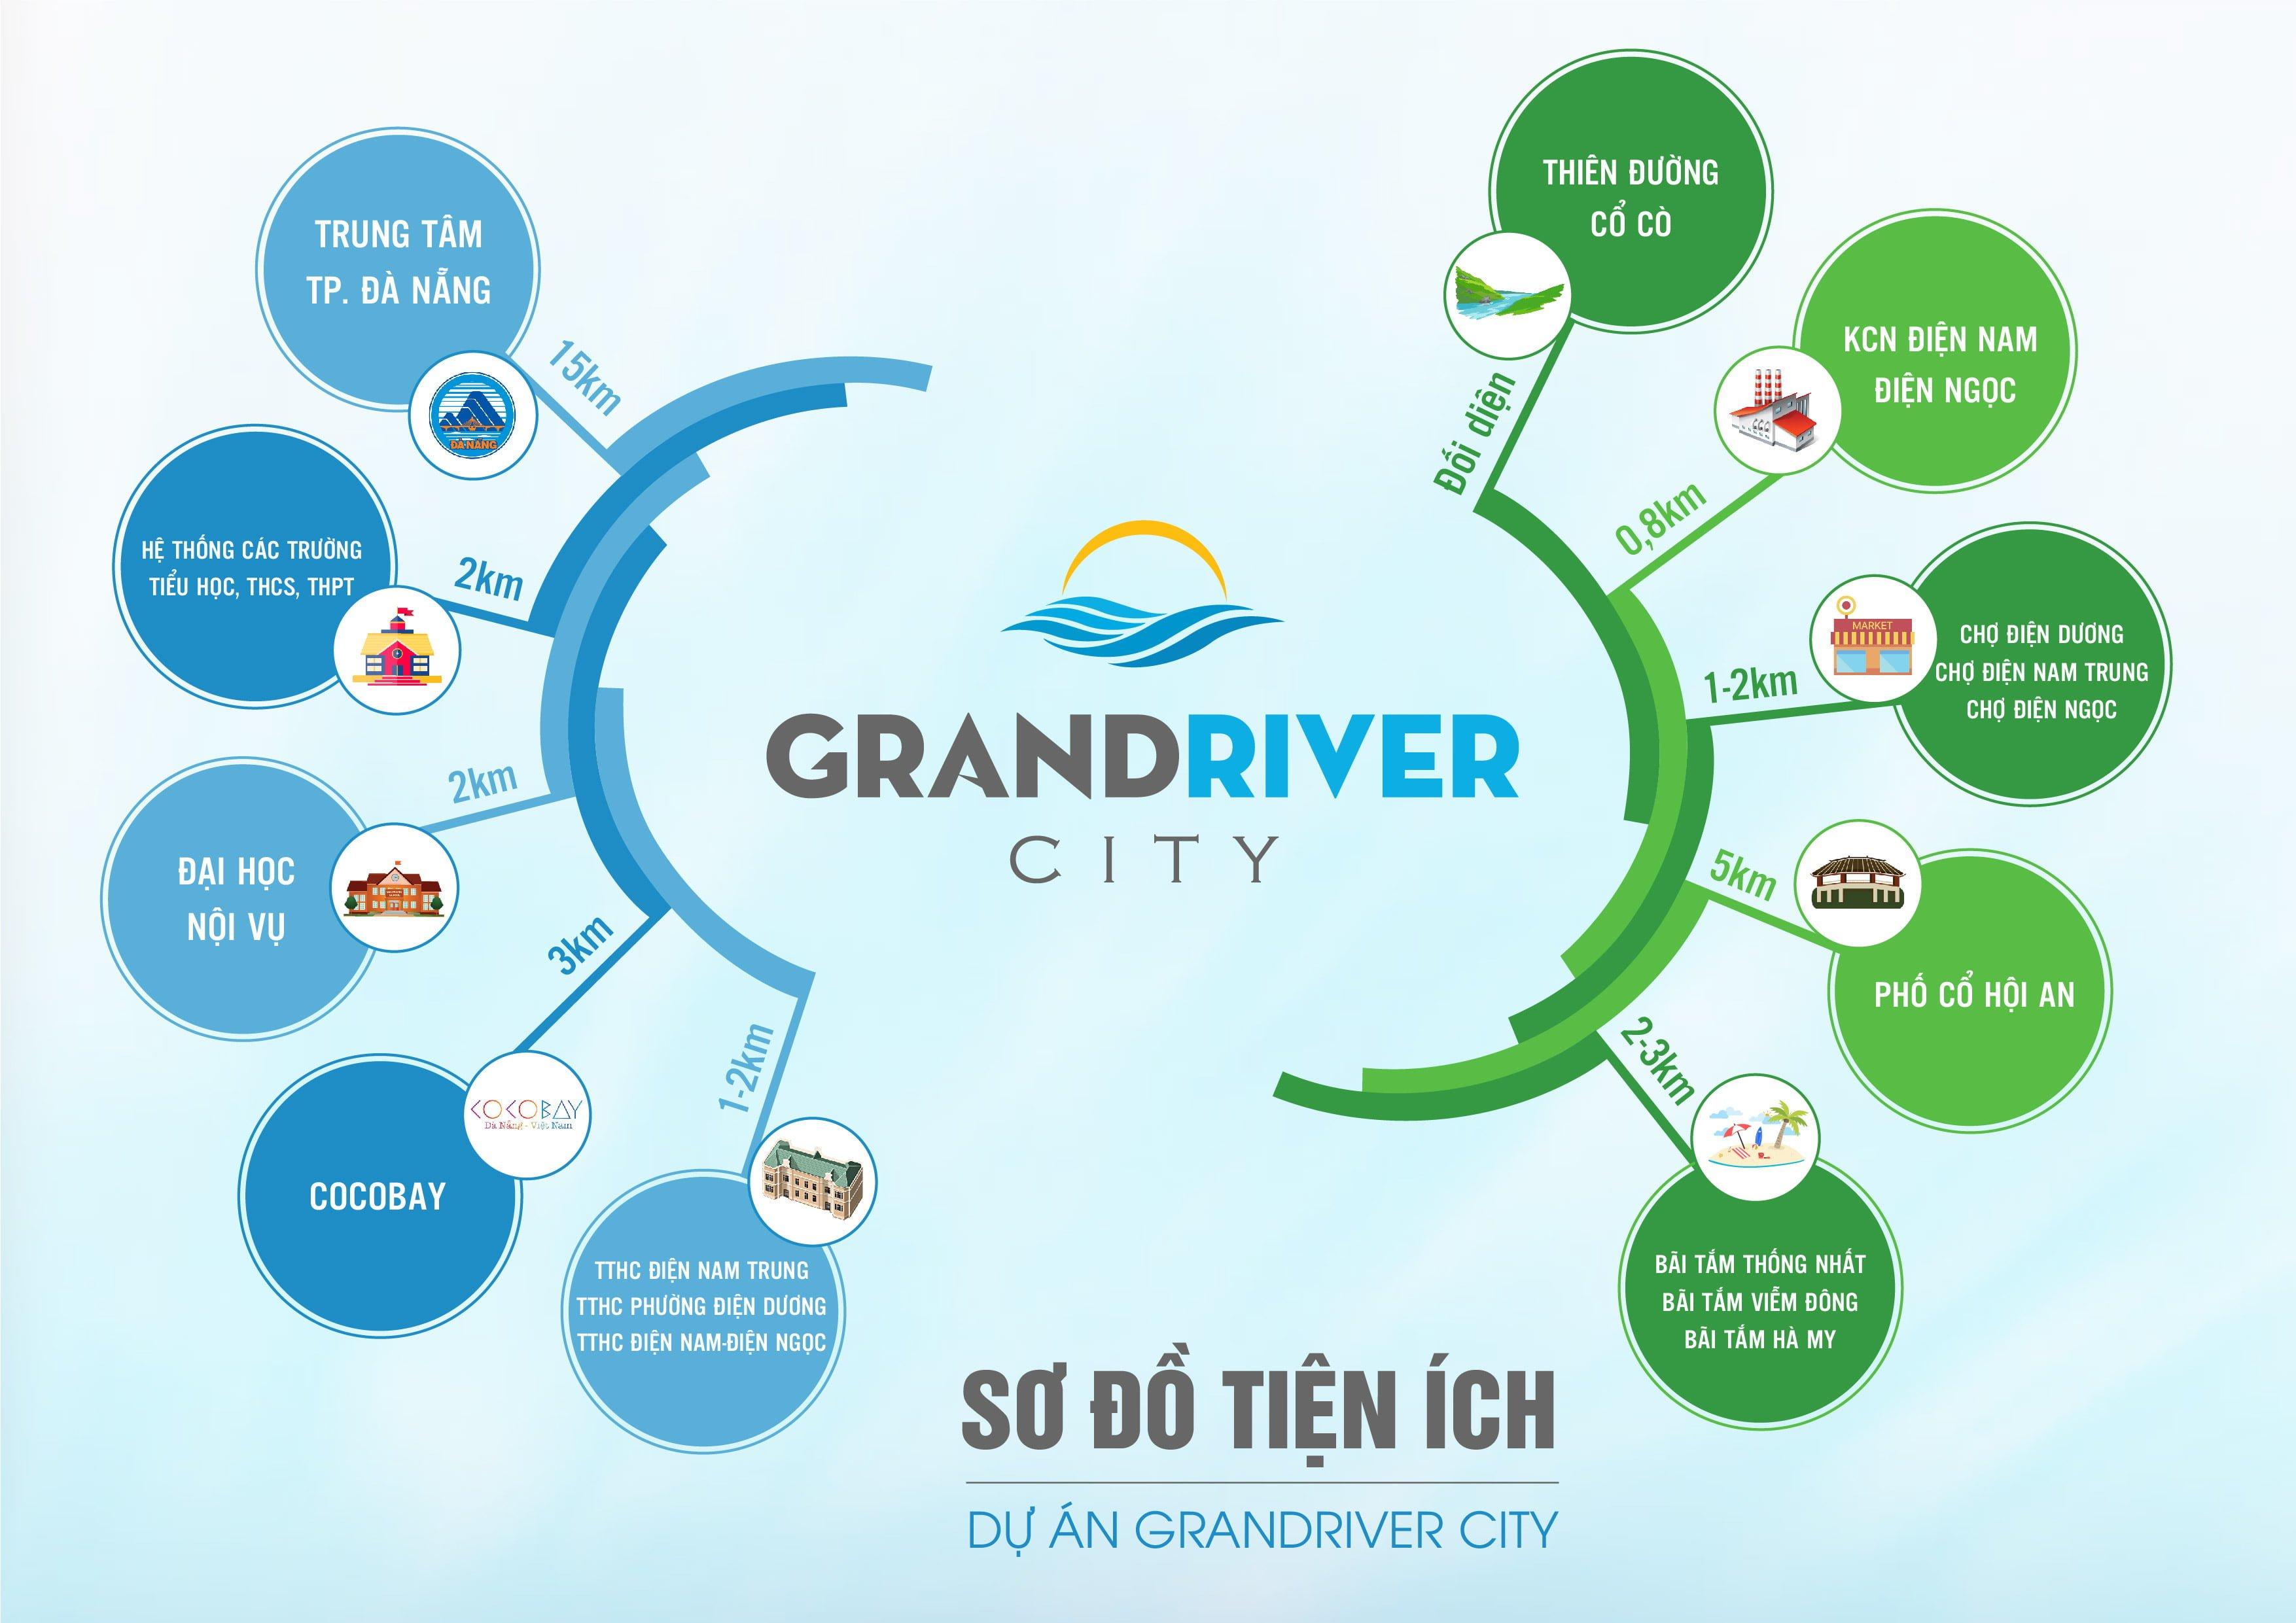 tien ich grand river city